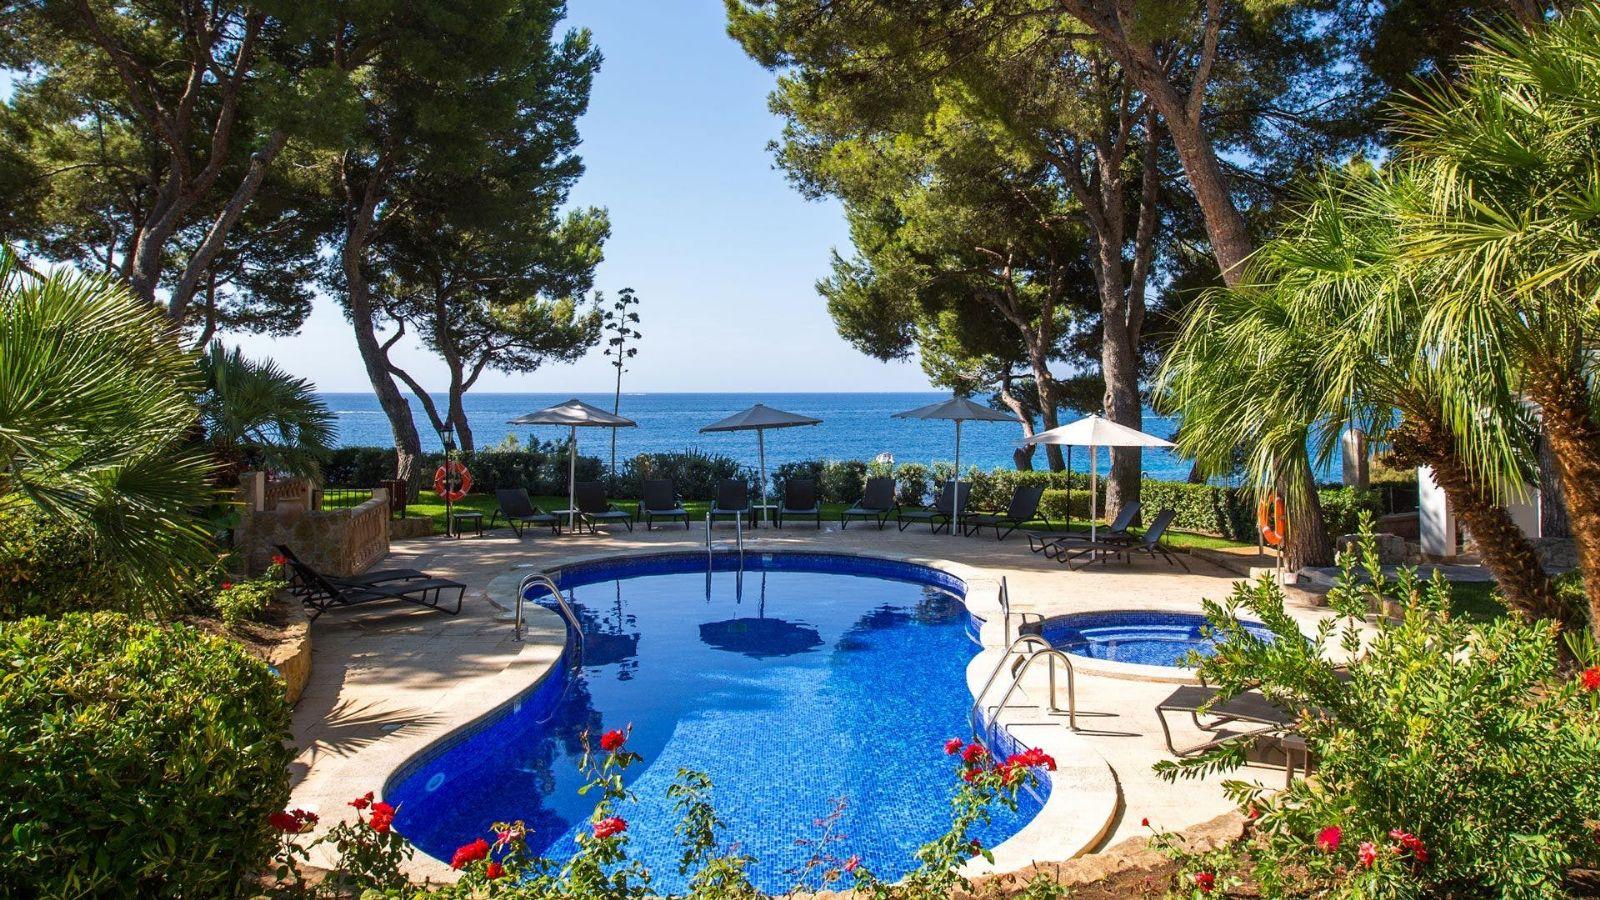 Bendinat hotel på Mallorca